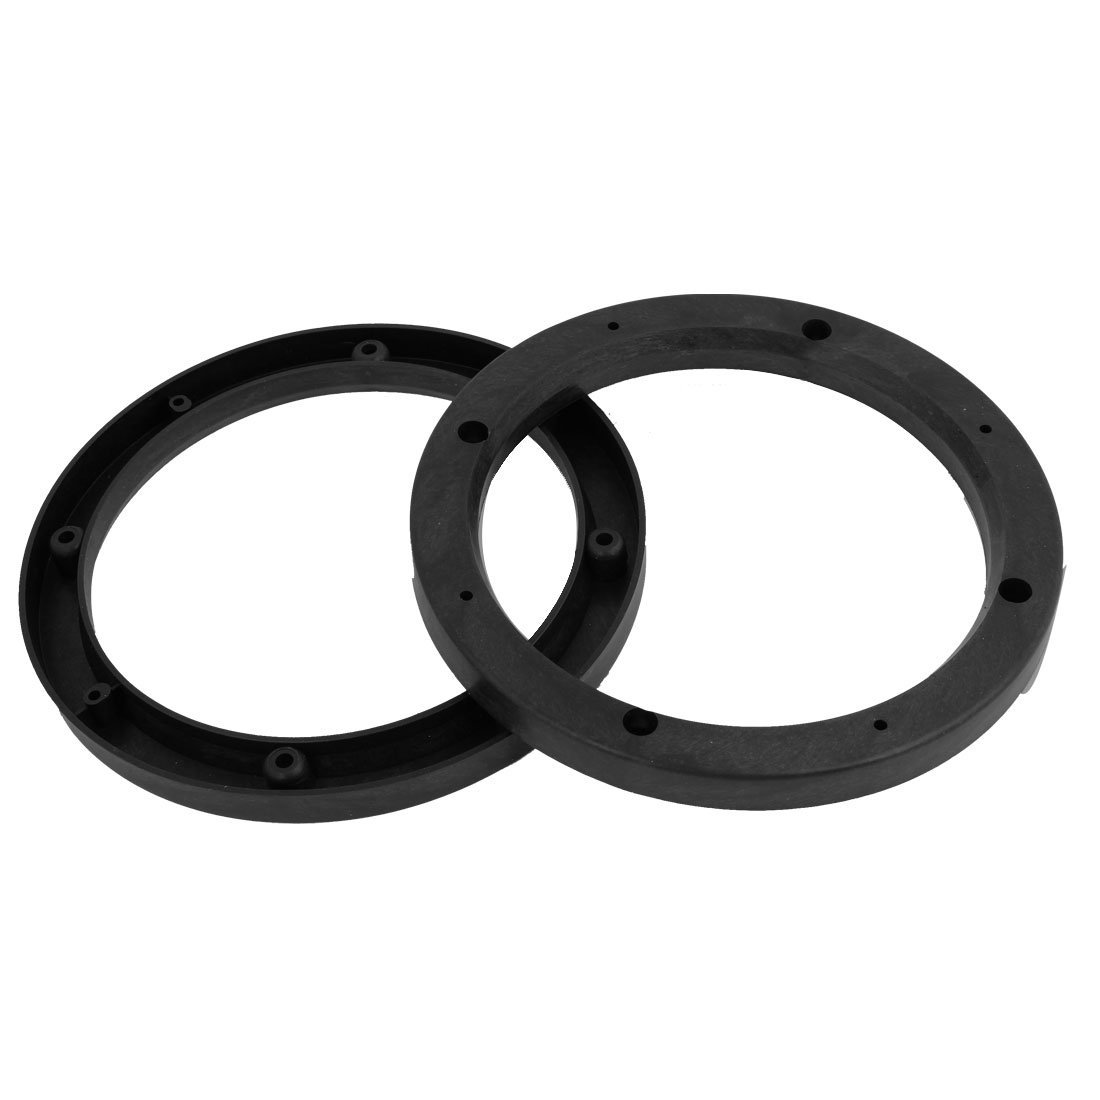 "uxcell 2 Pcs Car Black 6.9""Dia Round Speaker Spacers Extender Ring 14mm Depth"